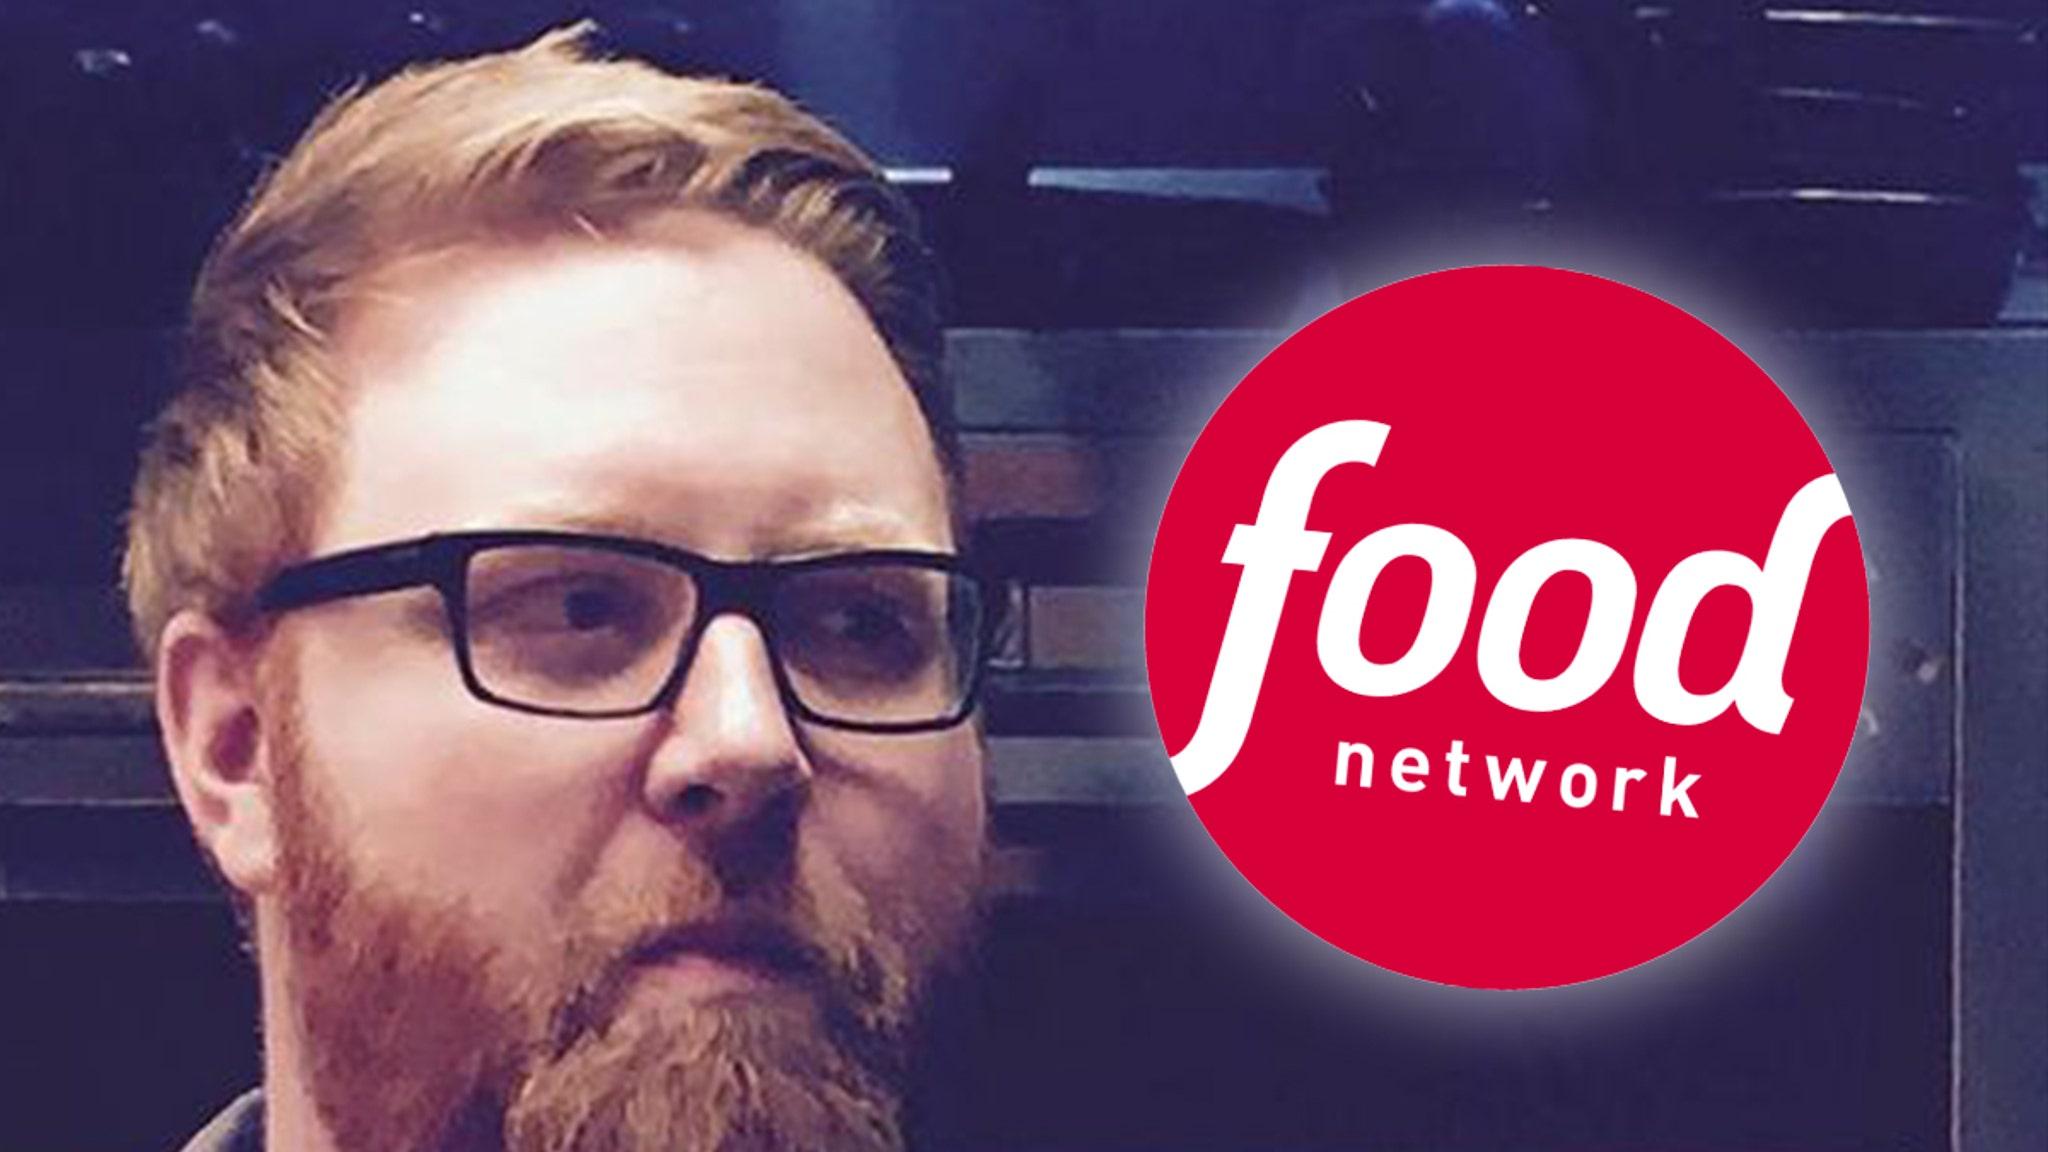 Ex-Food Network Host Josh Denny Rails on Women Over Texas Anti-Abortion Law thumbnail